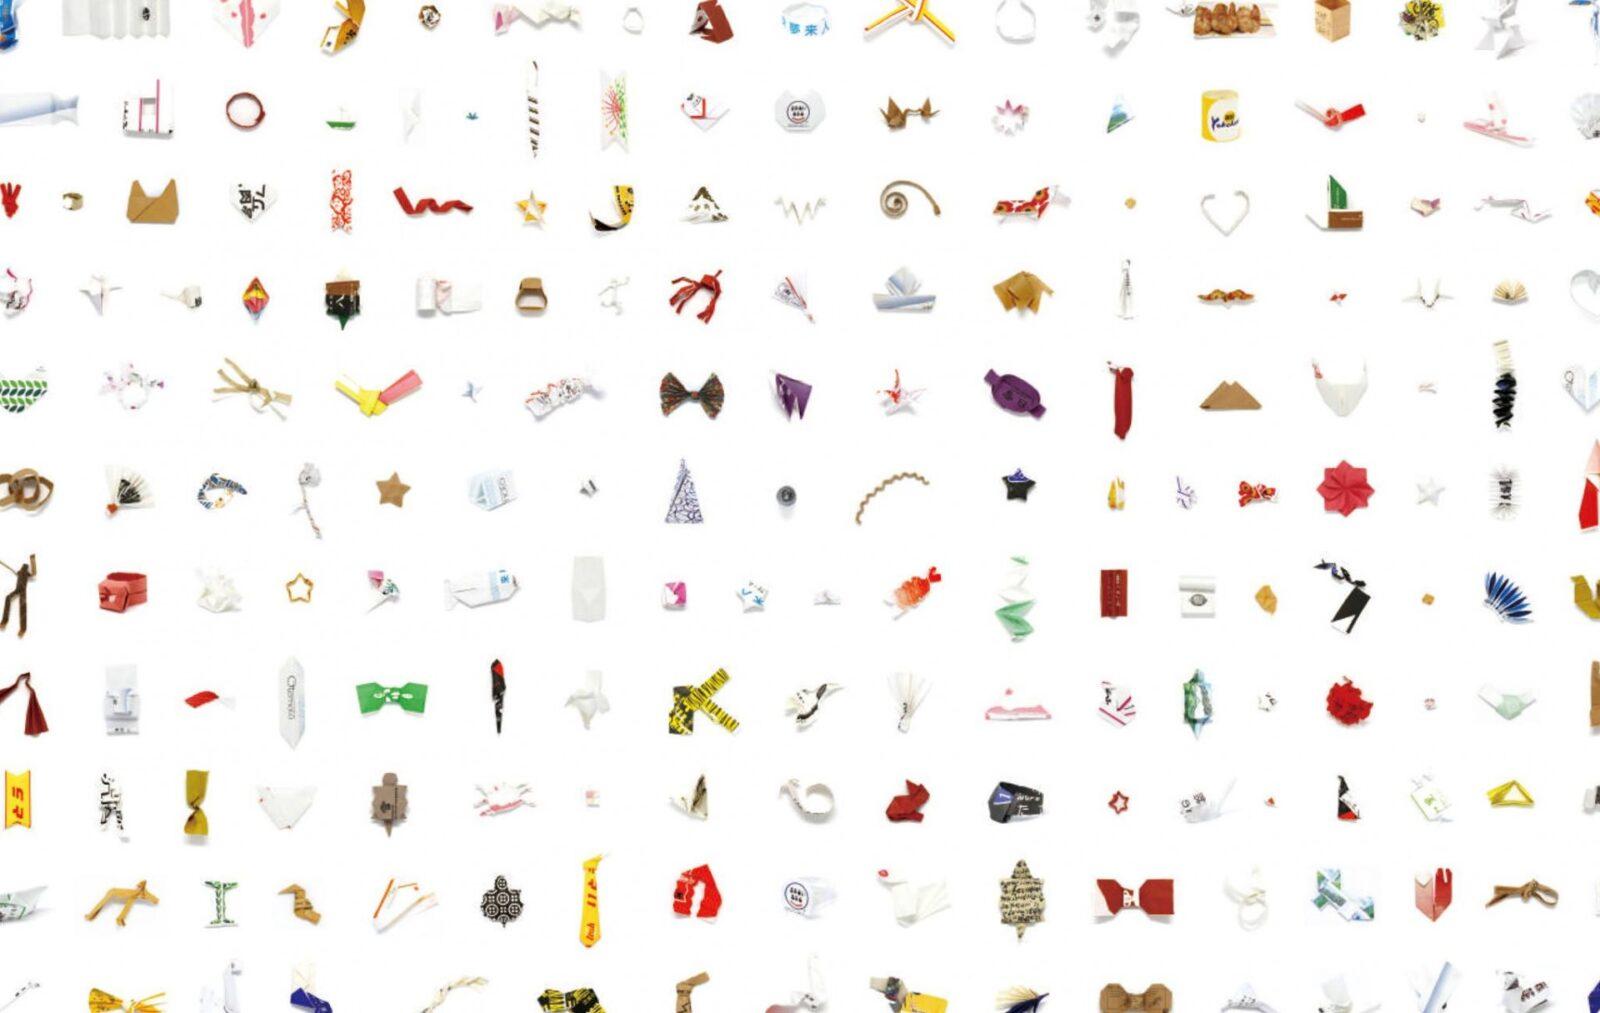 The Exhibition of 8,000 Chopstick Sleeve Sculptures Left Behind at Restaurants